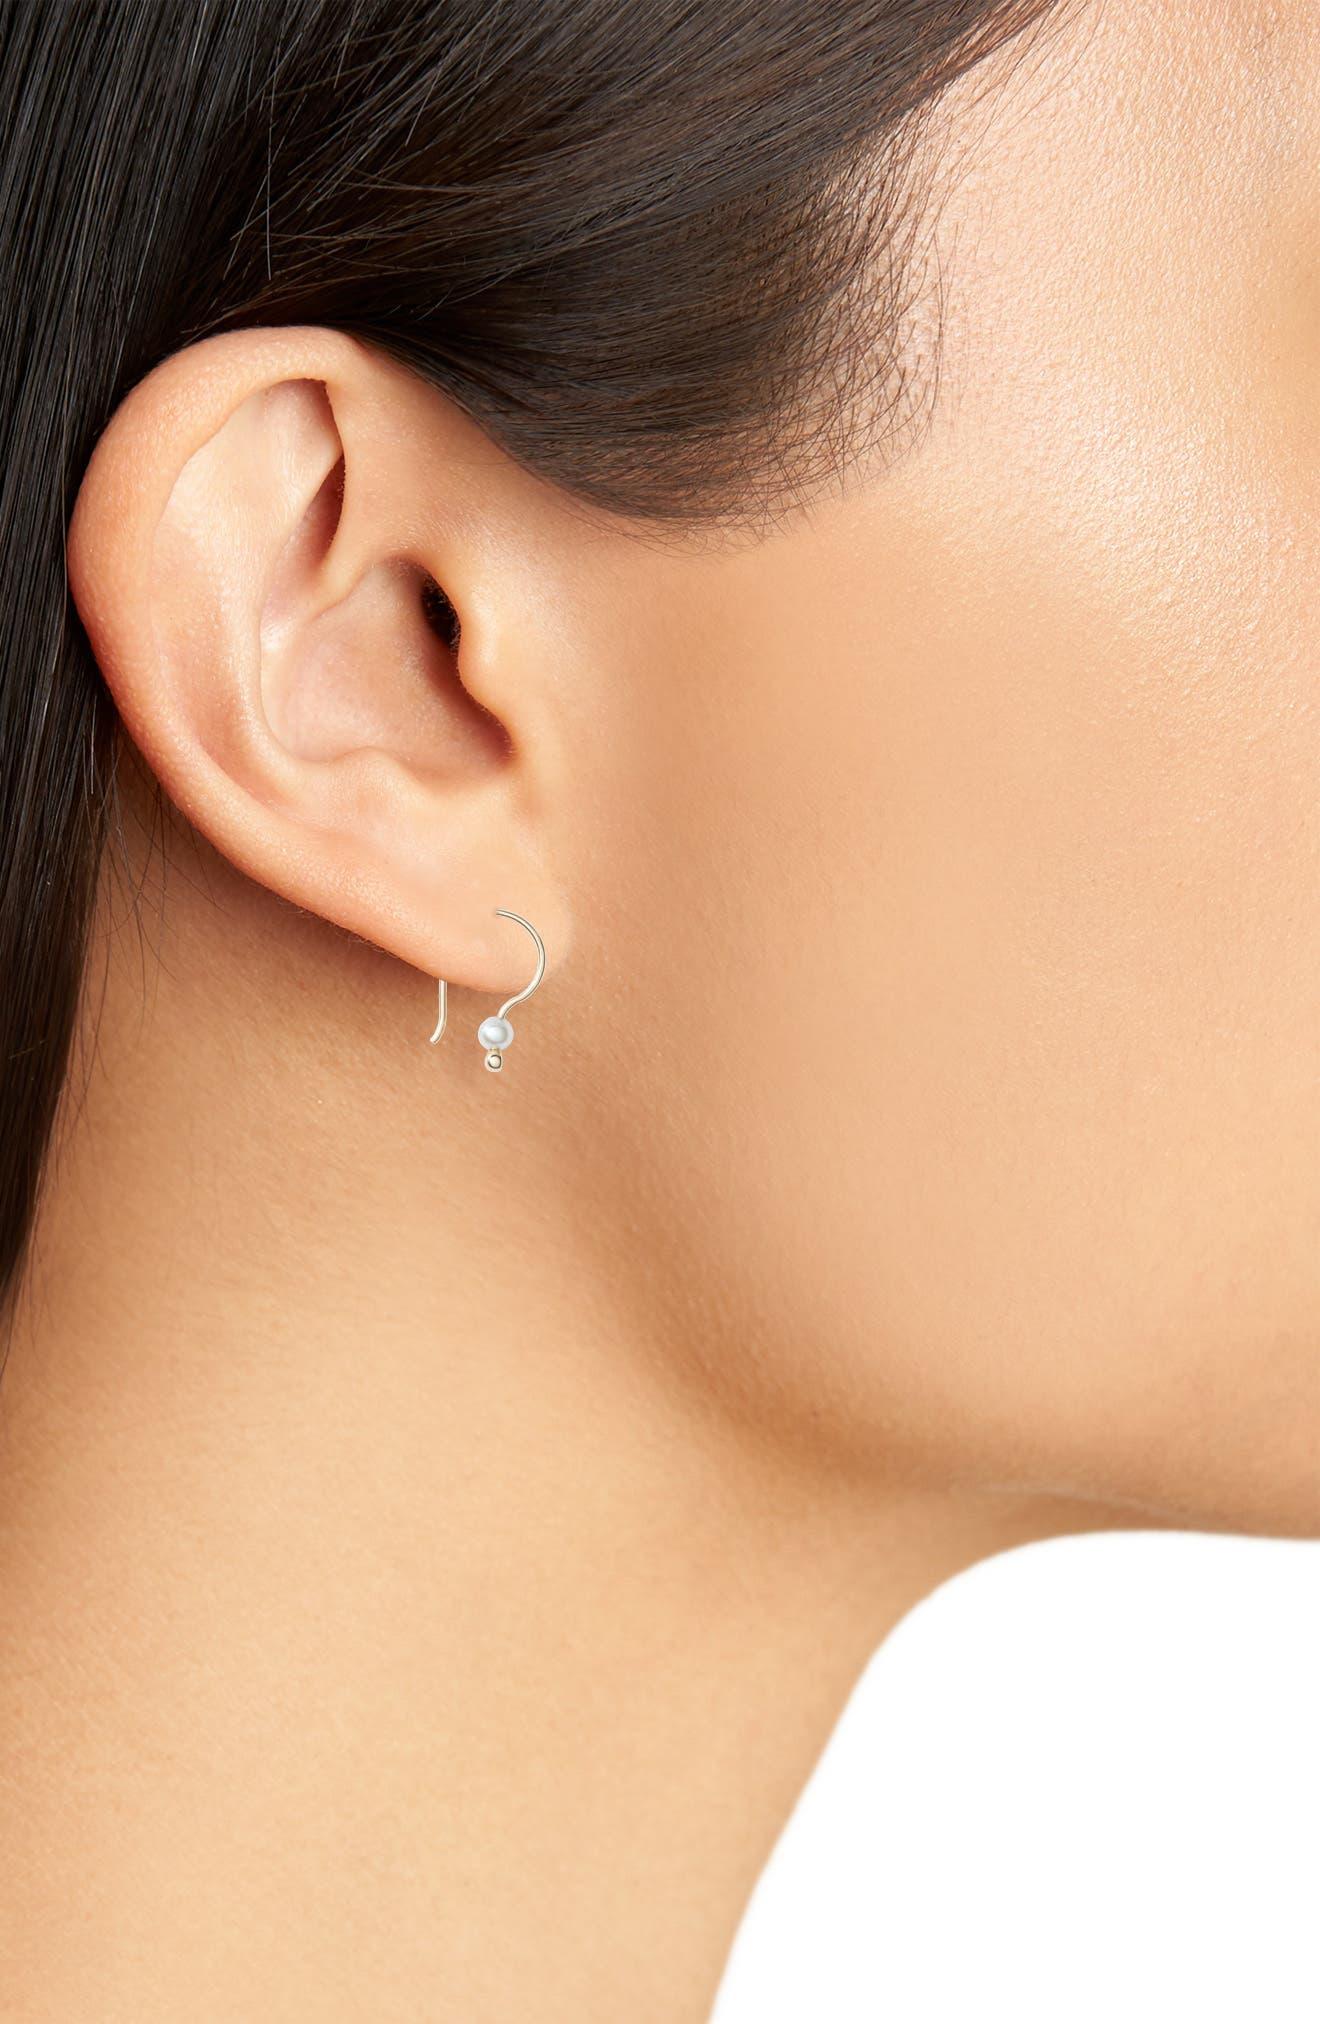 Diamond & Pearl Drop Earrings,                             Alternate thumbnail 2, color,                             GOLD/ PEARL